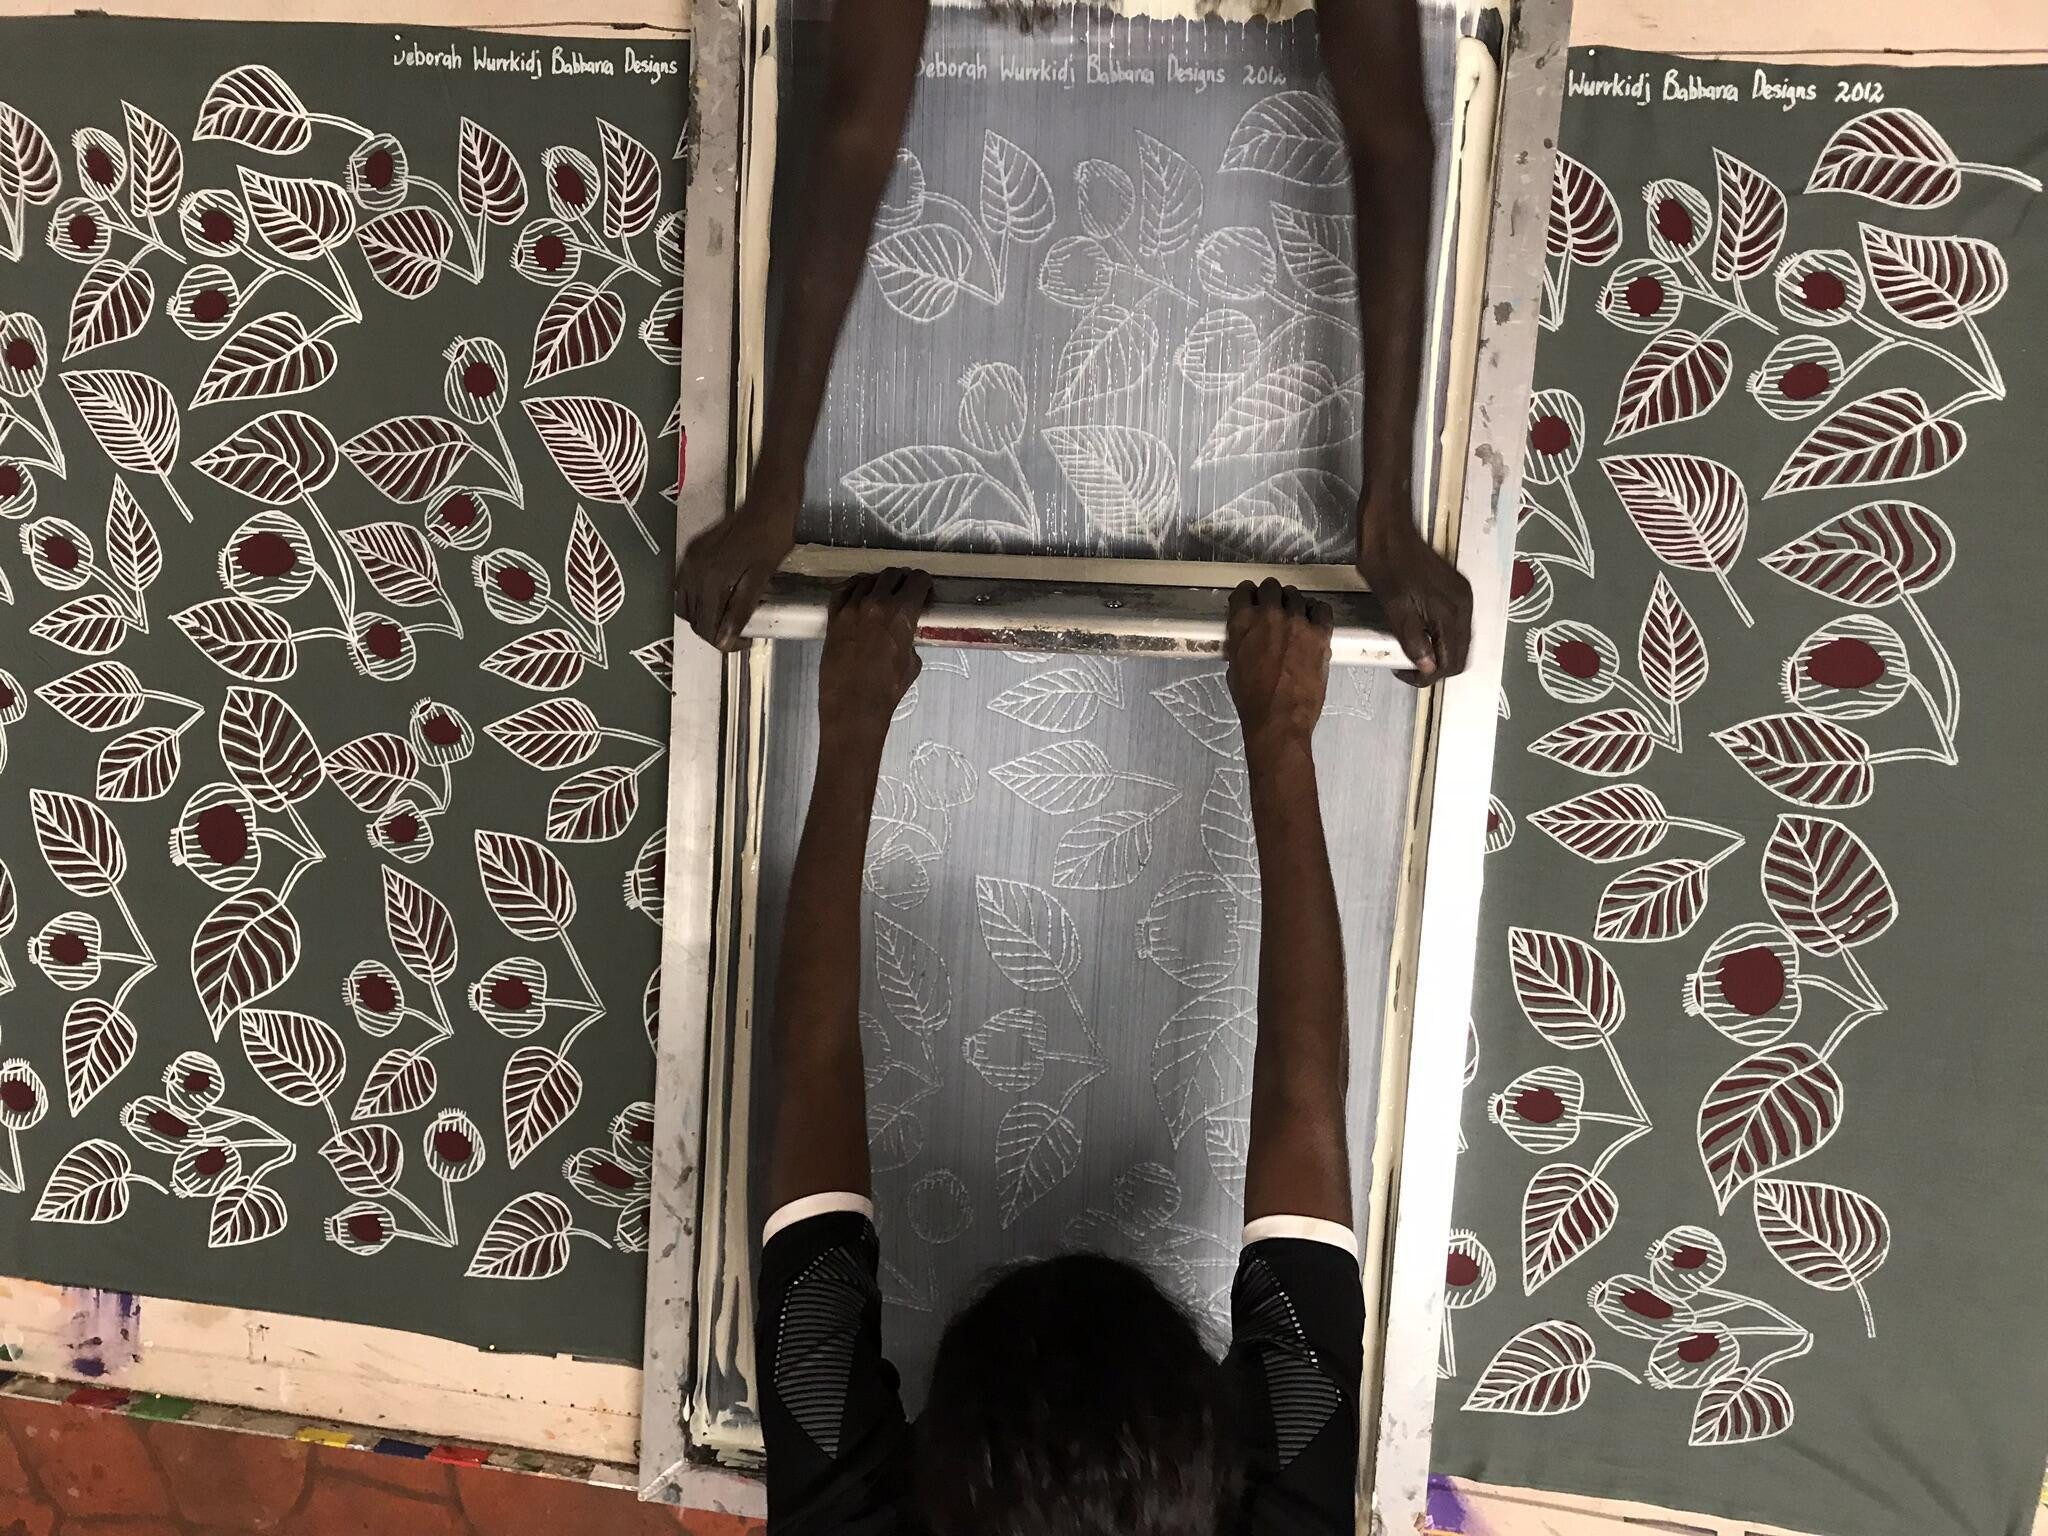 Babbarra Women's Centre, screen printing process, Maningrida, Australia